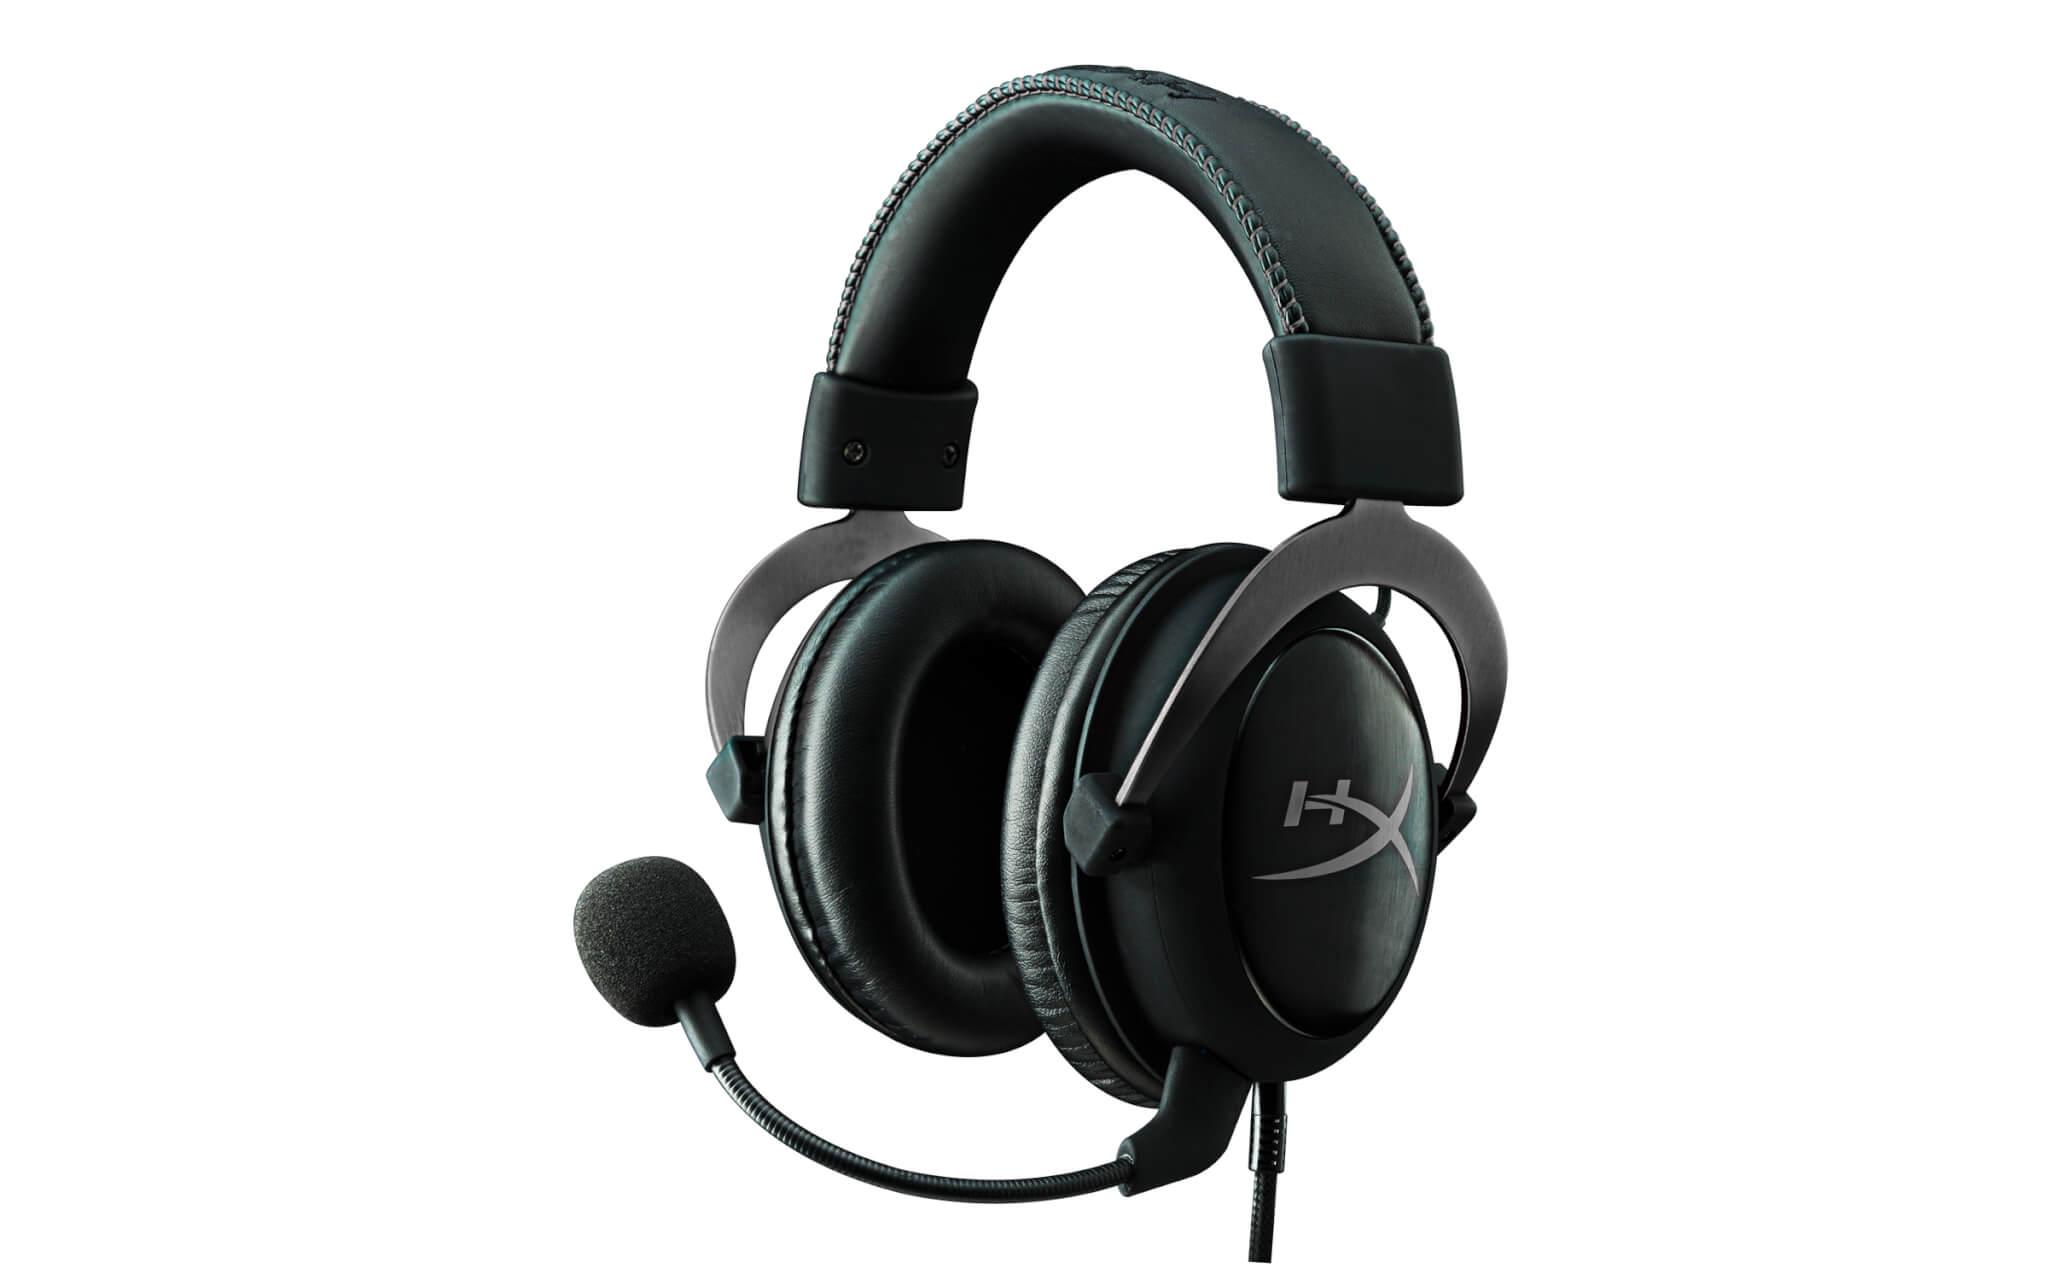 The HyperX Cloud II gaming headset.